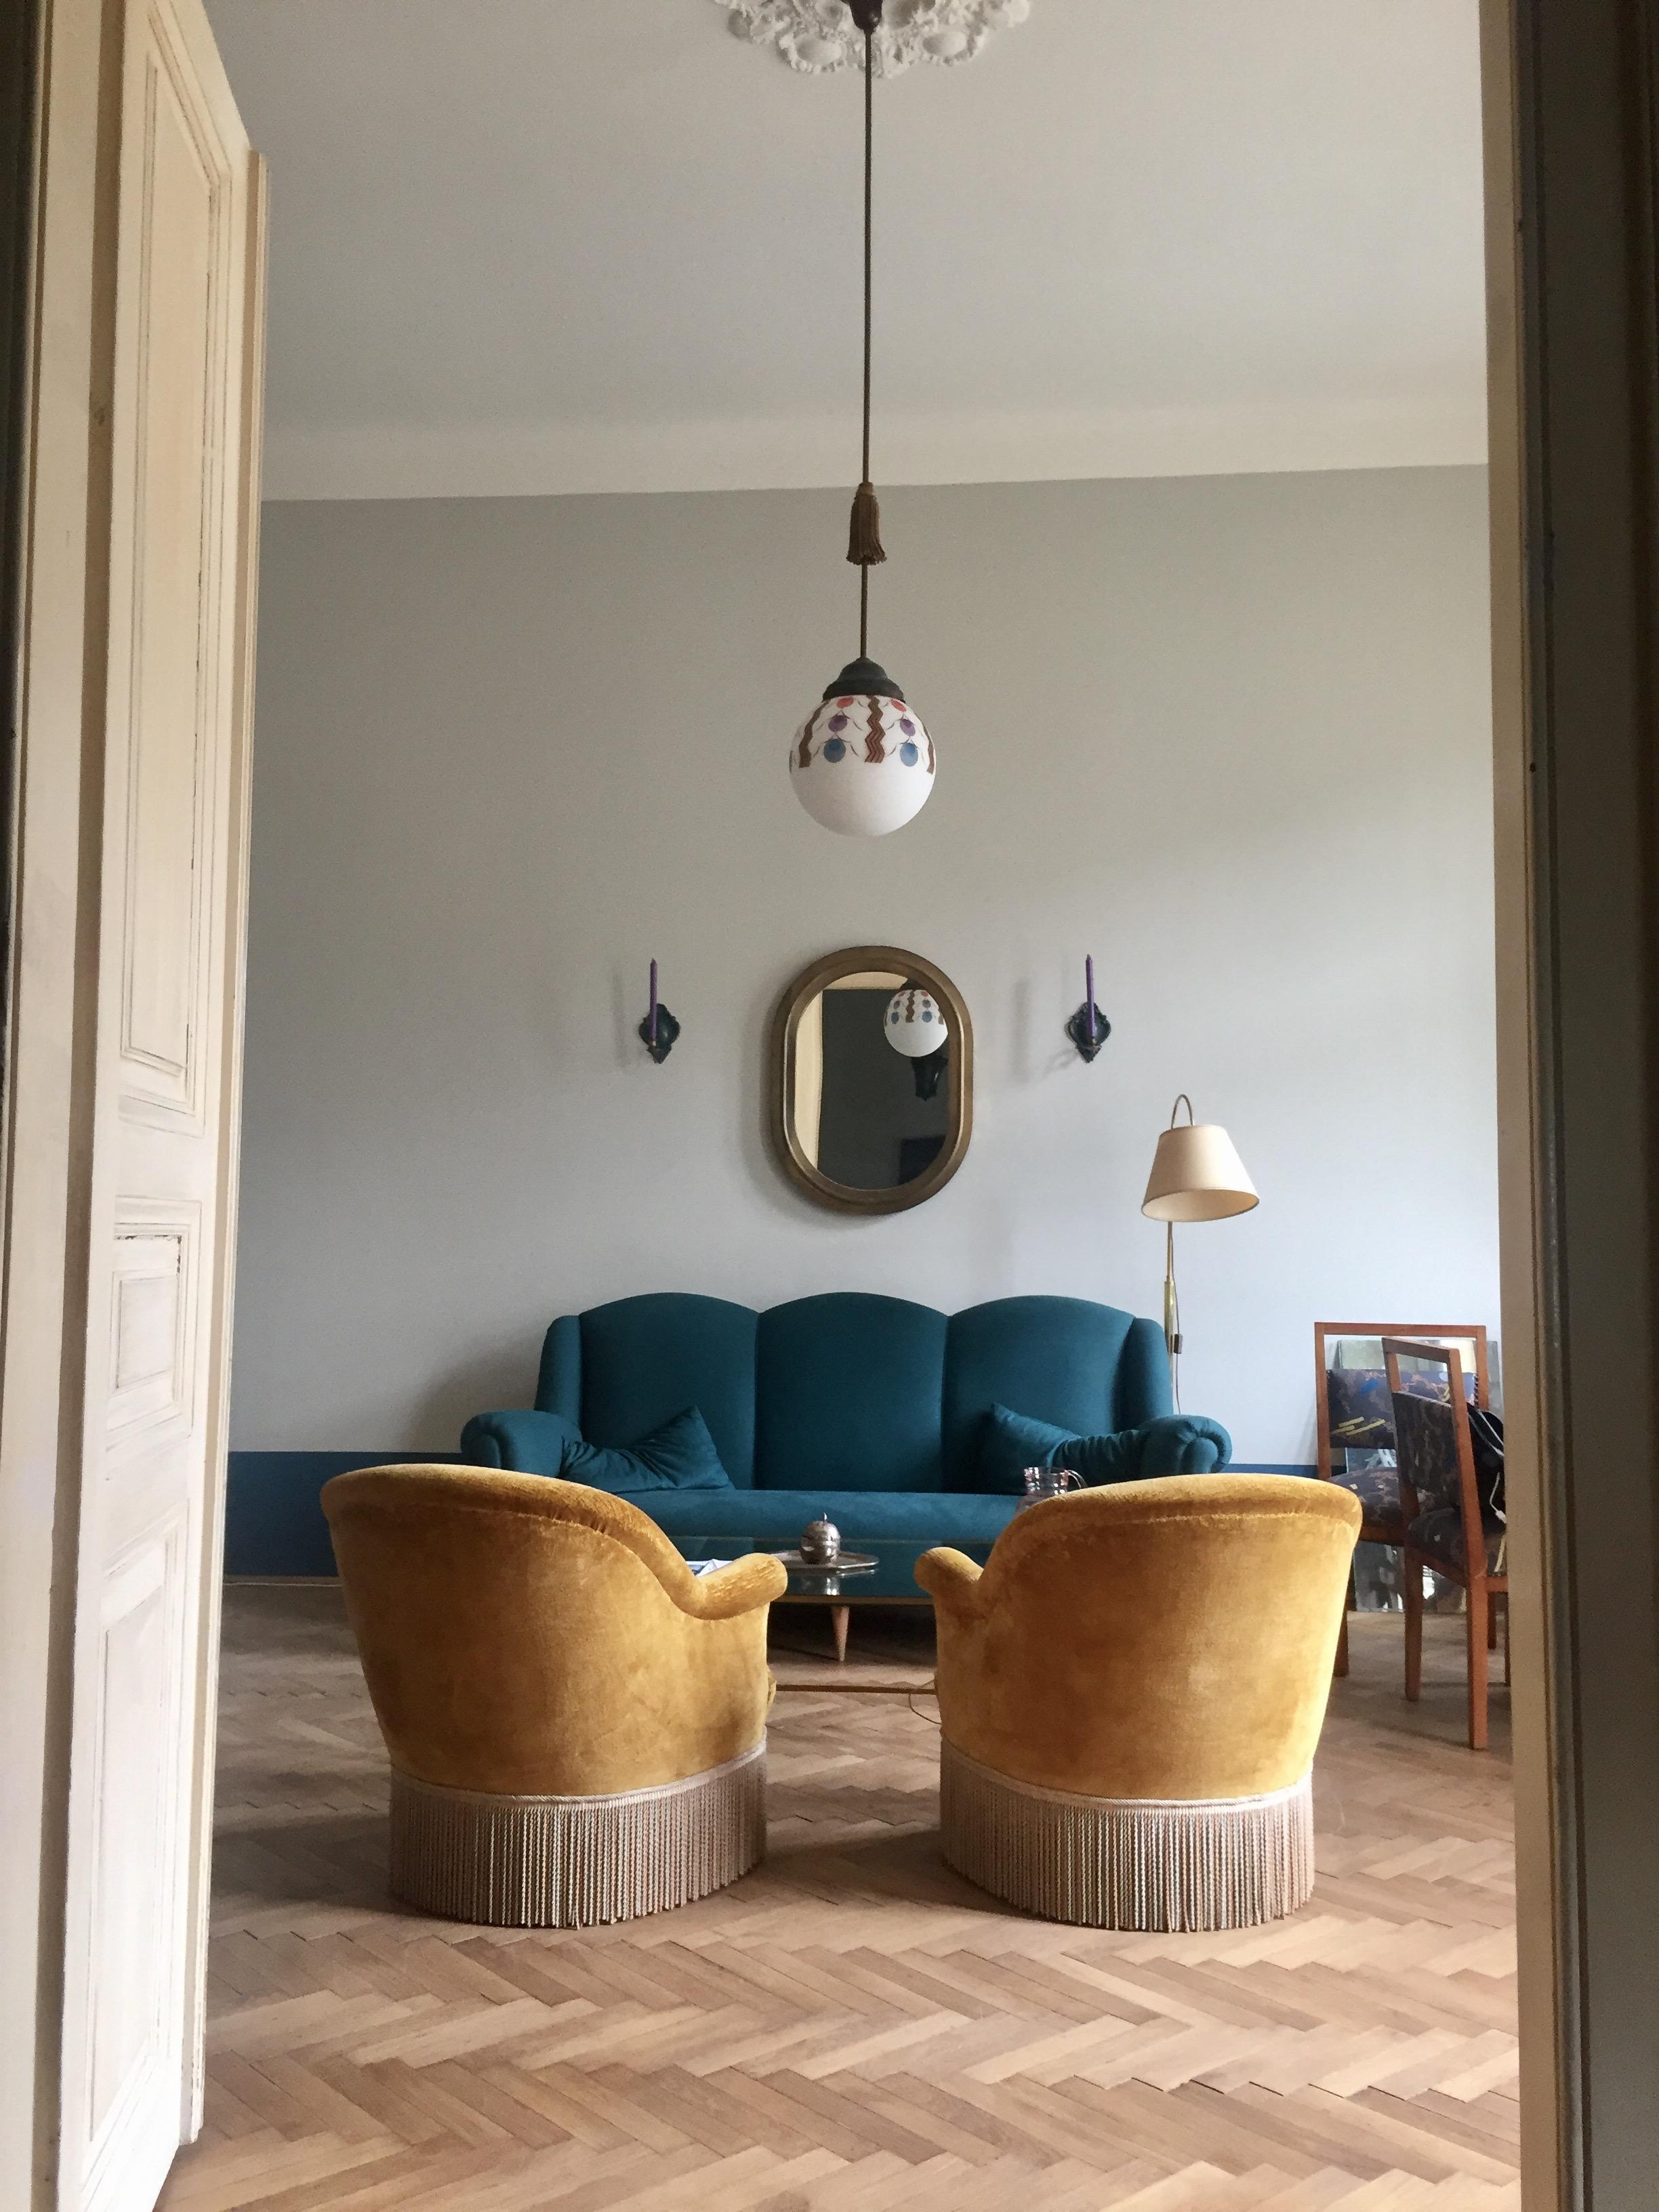 Petrolfarbenes Sofa • Bilder & Ideen • COUCHstyle